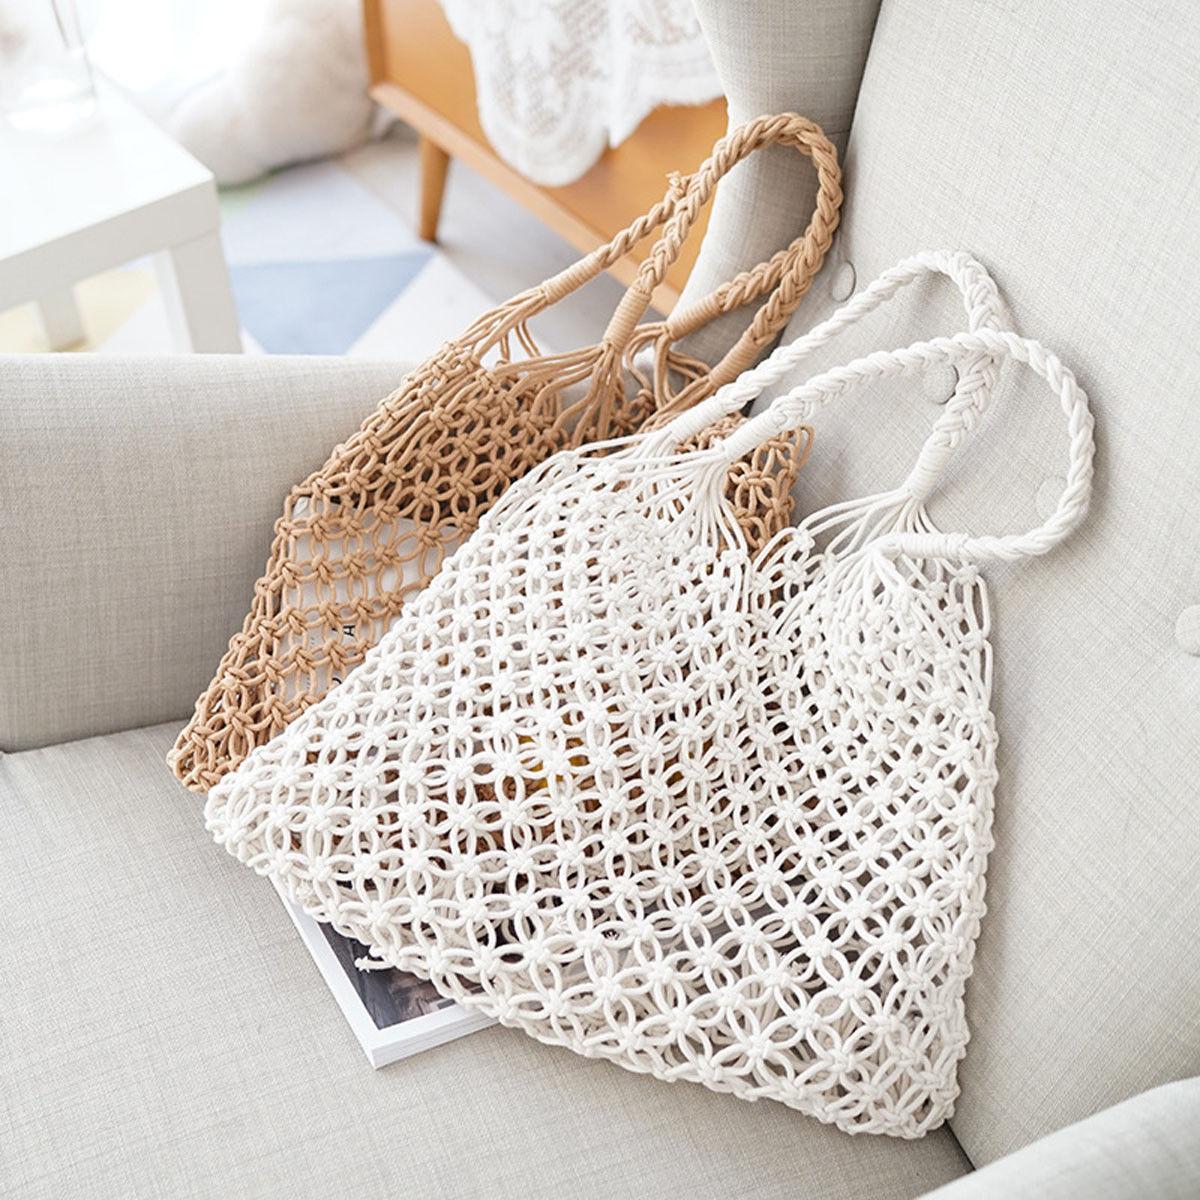 Vintage Women Bag Large Straw Bag Handmade Crochet Braid Fringed Bag Knitted Handbag Beach Bohemian Woman Shoulder Messenger Bag